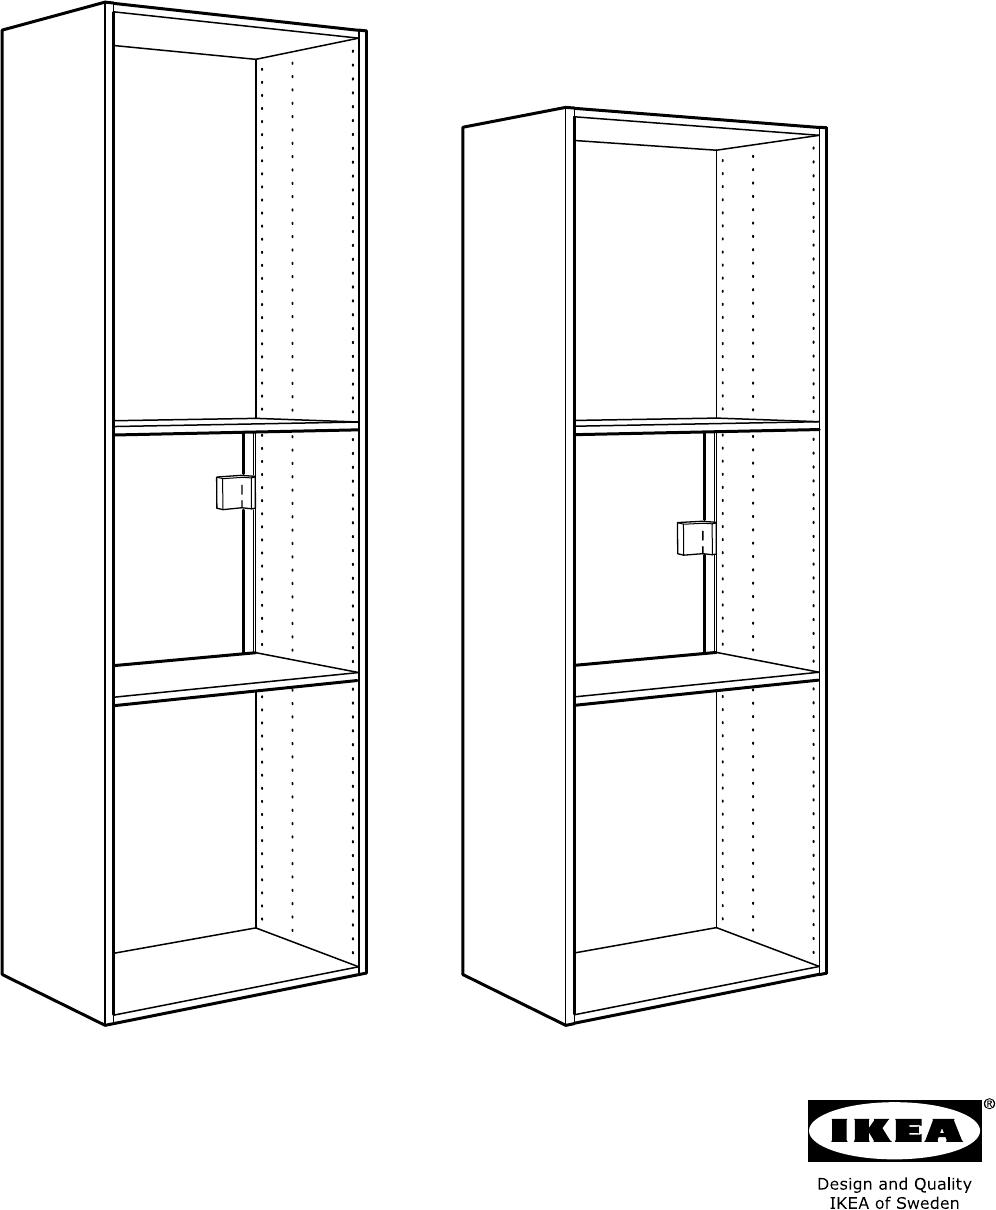 Handleiding Ikea Faktum Hoog Kastelement Koelkast Oven